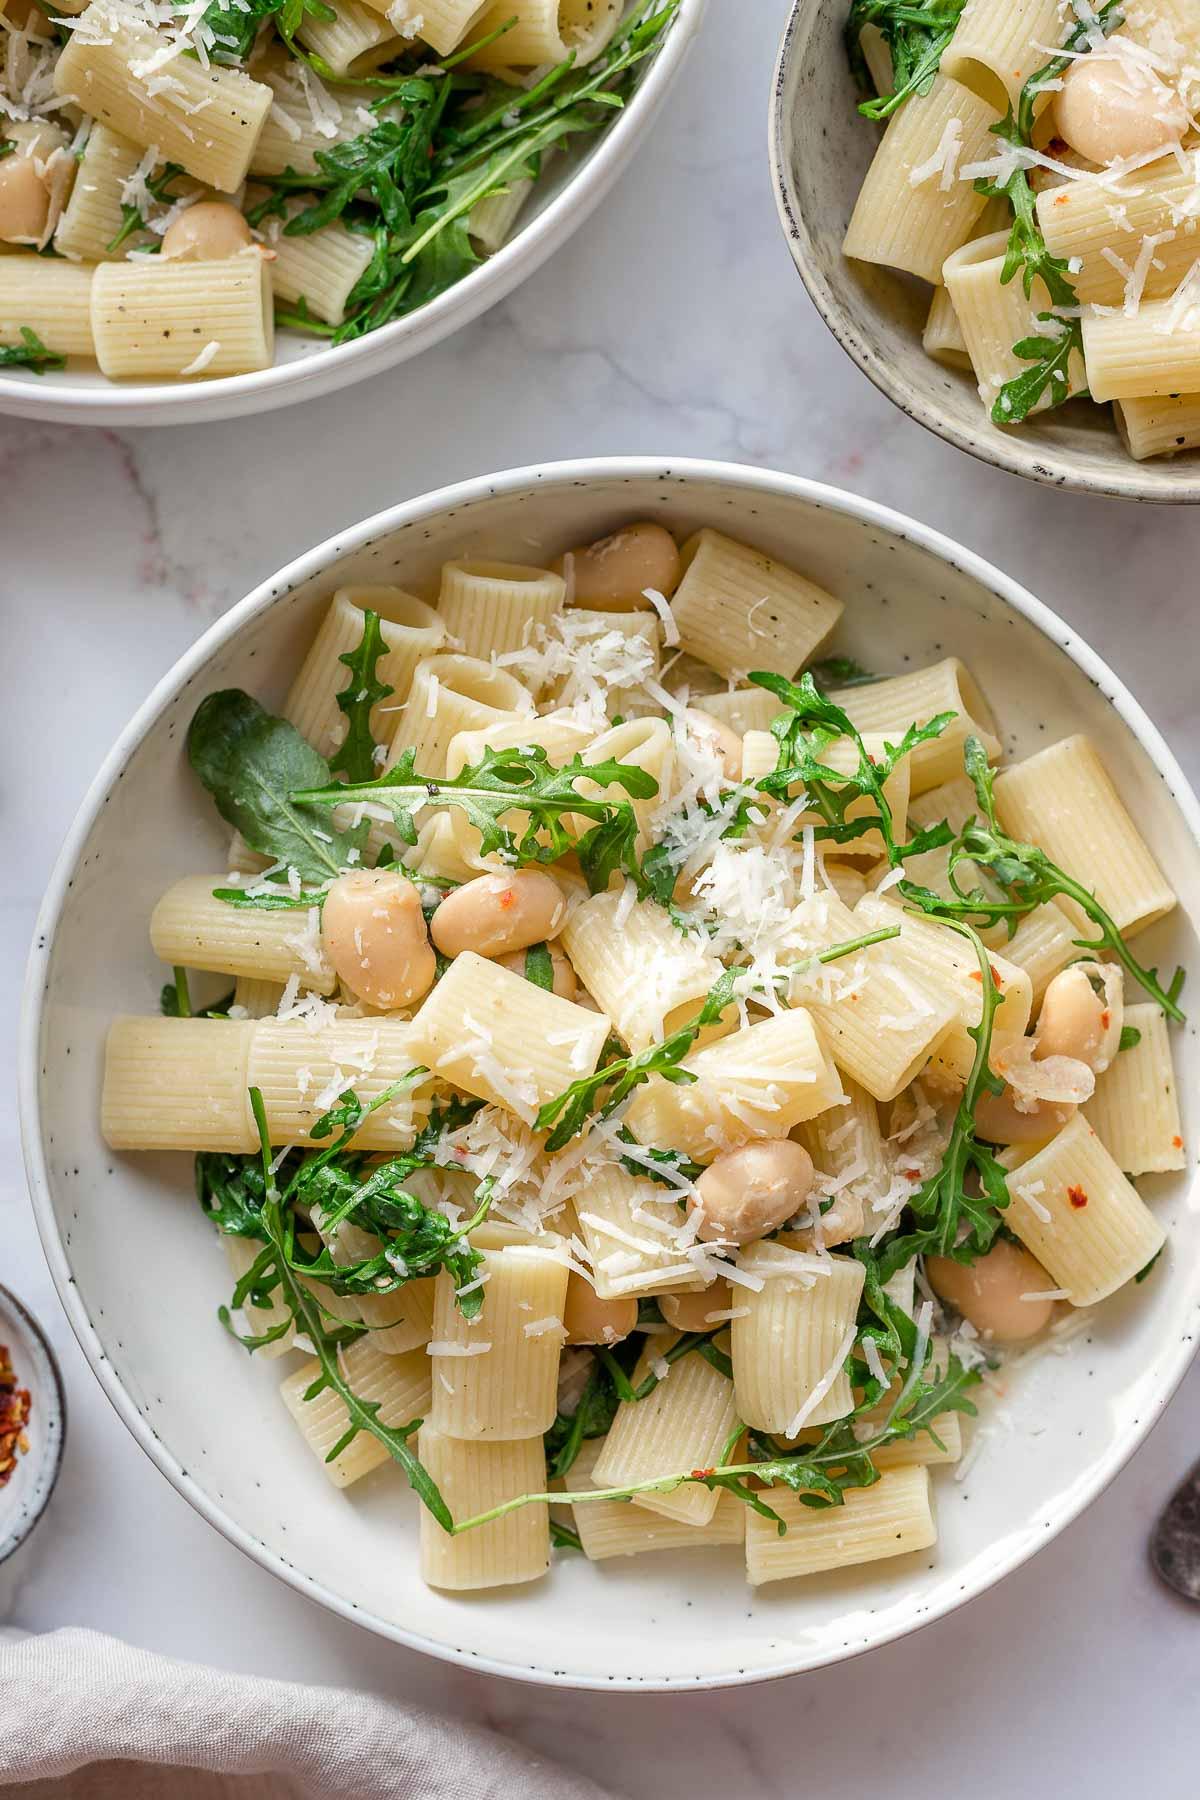 Pasta with White Beans, Arugula and Lemon